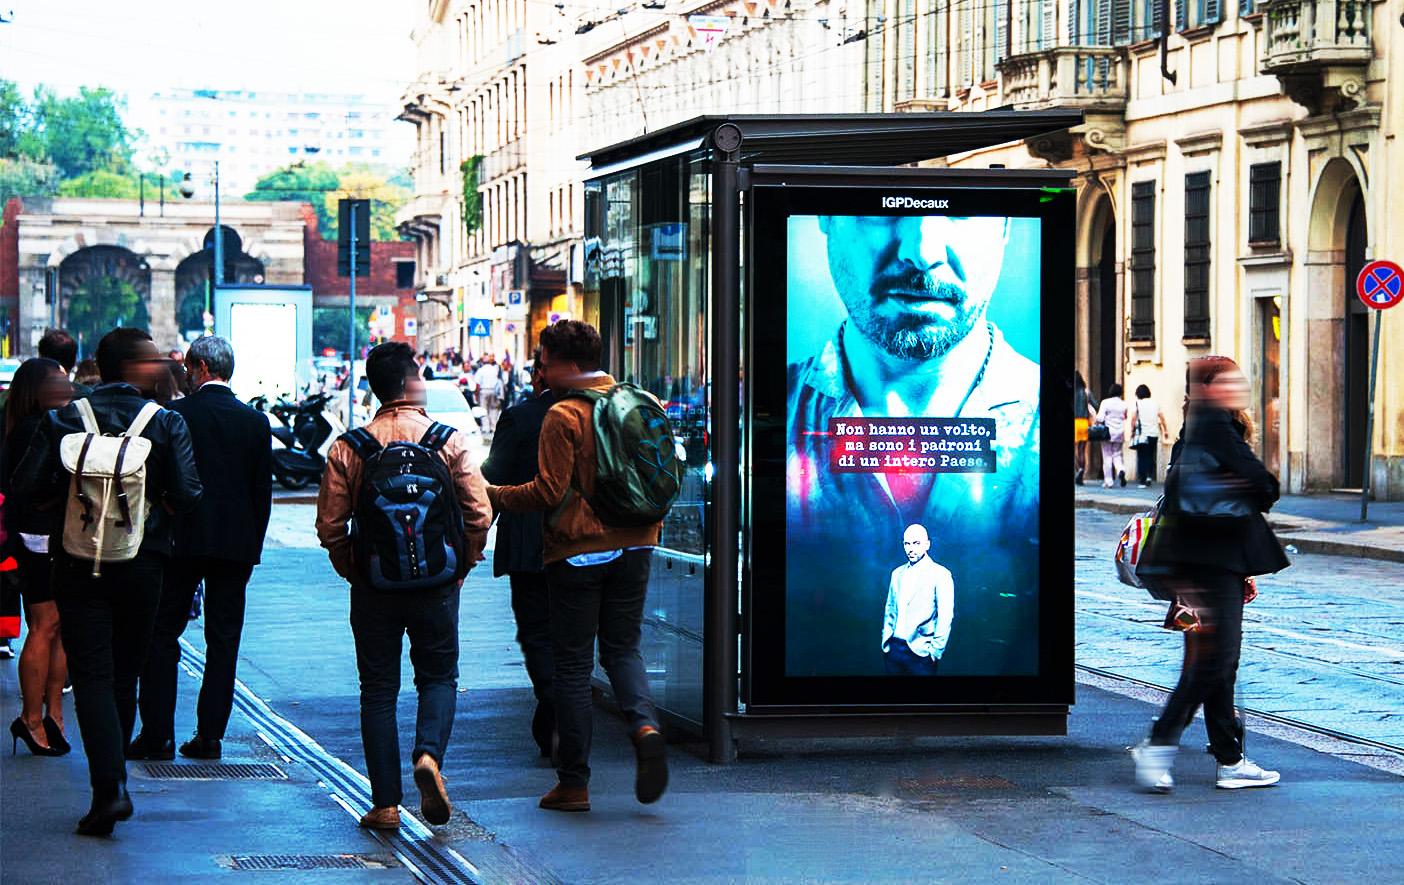 Digital OOH advertsing_pensilineDigitali a Milano IGPDecaux